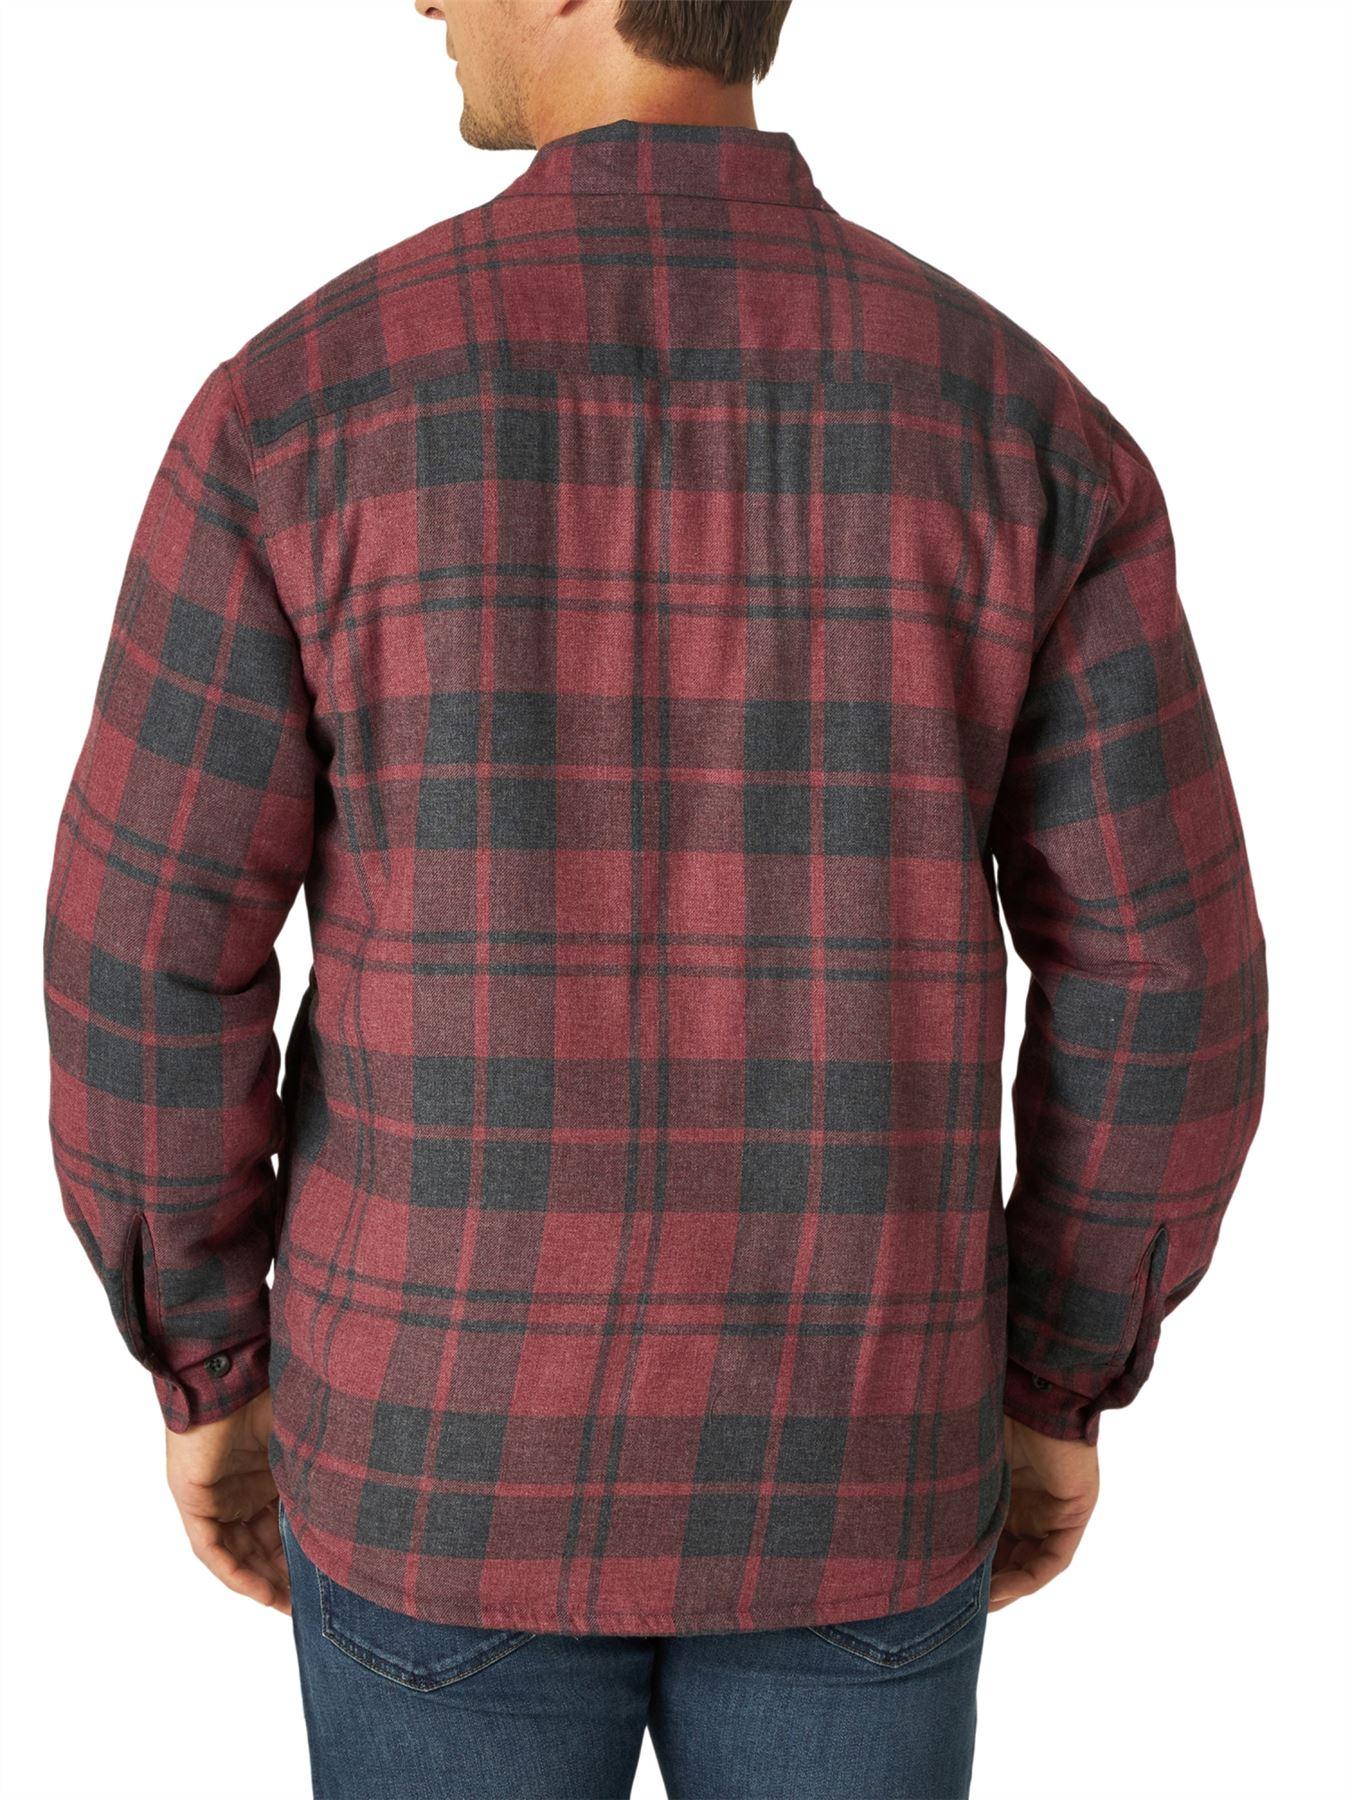 miniature 11 - Homme-Wrangler-Sherpa-Polaire-Double-Lumberjack-Rembourre-Veste-Chemise-Boutonnee